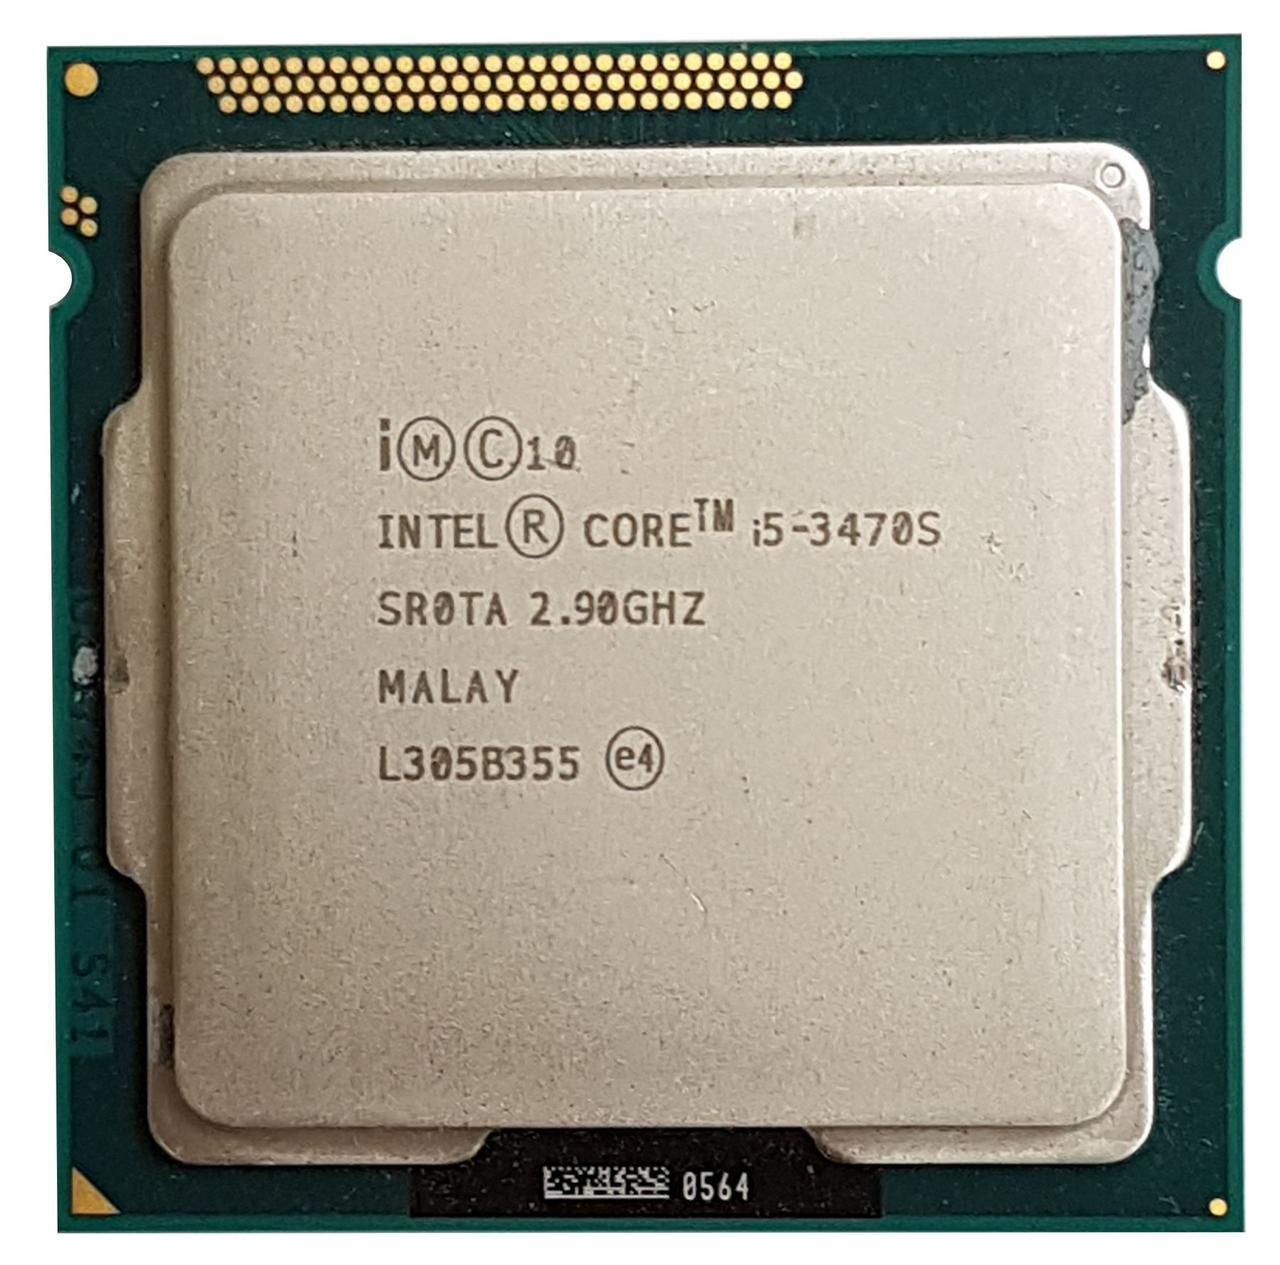 Процессор Intel Core i5-3470S 2.90GHz/6M/5GT/s (SR0TA) s1155